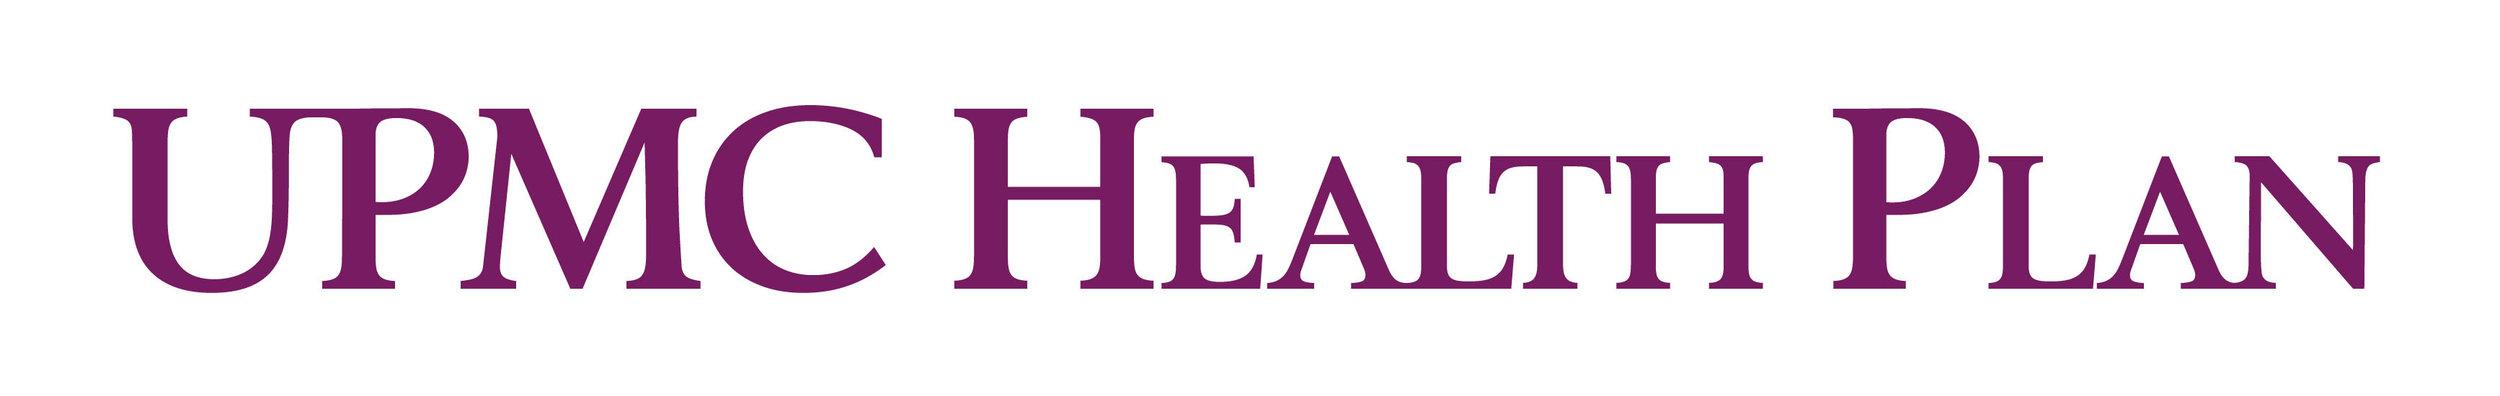 UPMC Health Plan Logo in Color 2016.jpg